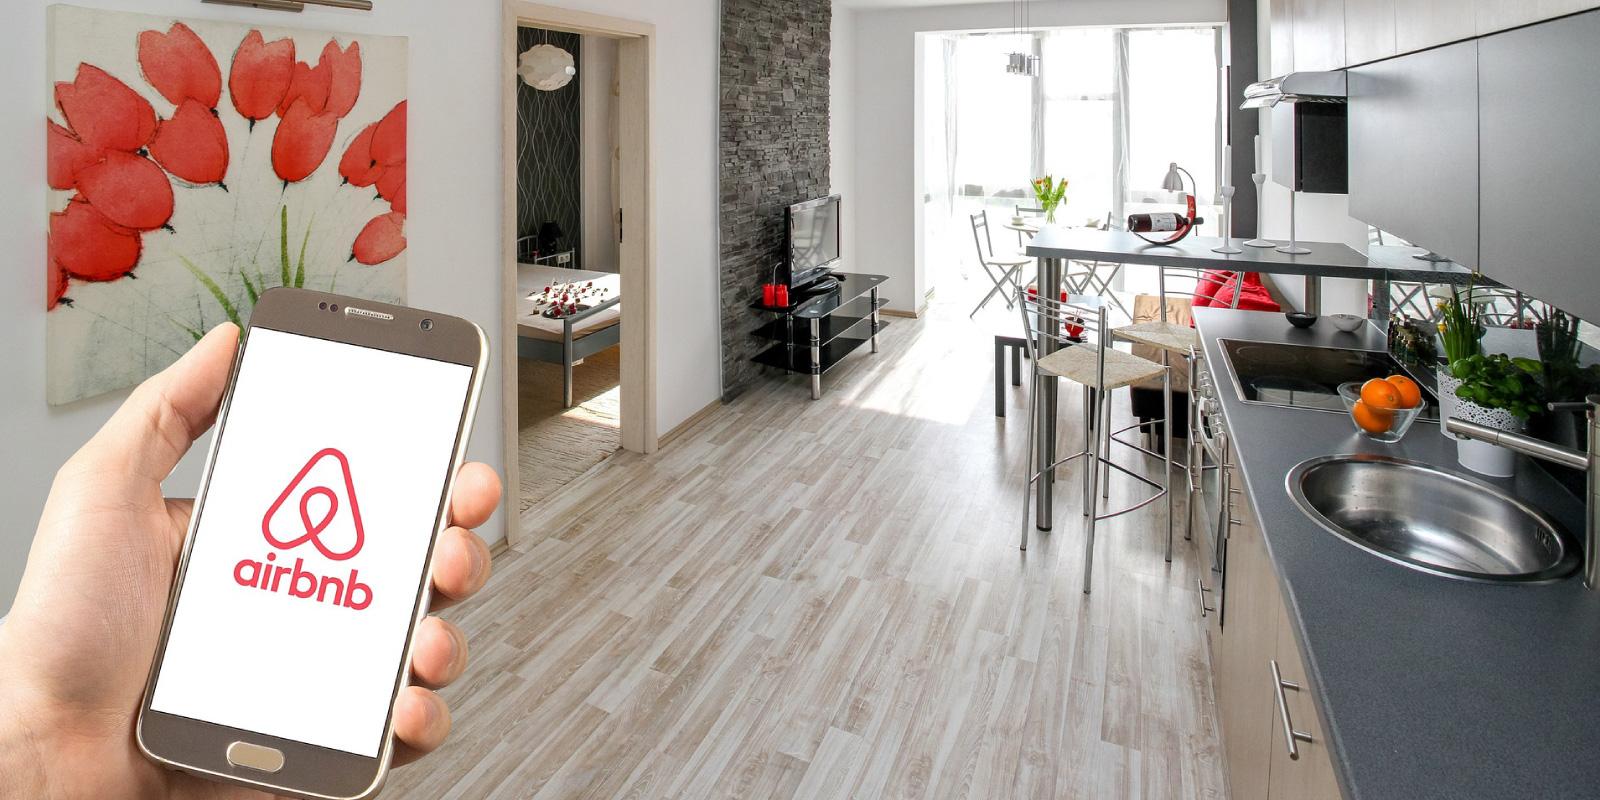 Airbnb: Σήμερα ενεργοποιείται η πλατφόρμα από την ΑΑΔΕ – Πρόστιμο 5.000 ευρώ στους παραβάτες